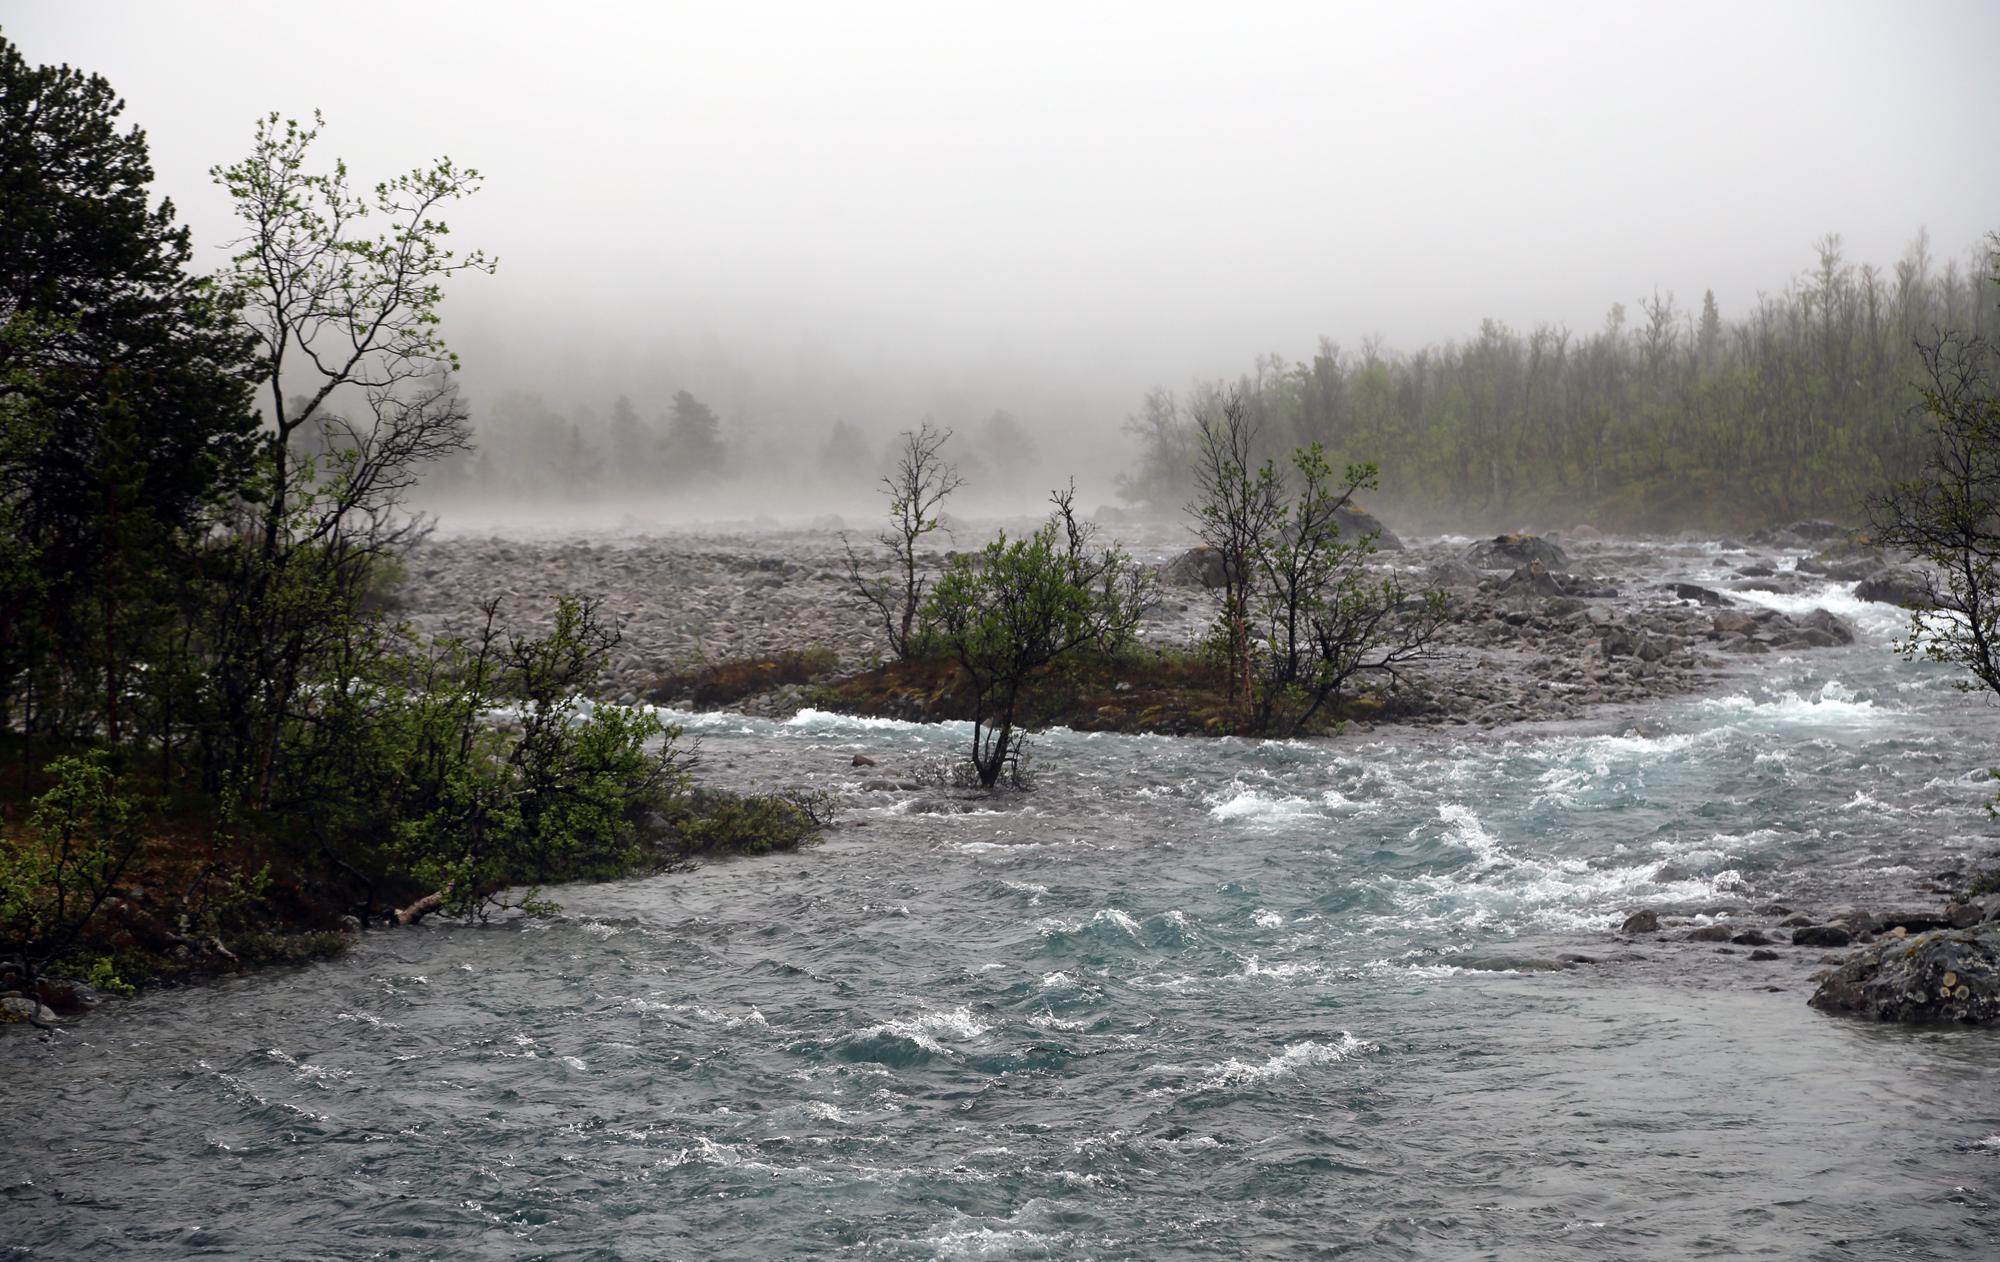 Soerlenangsbotn im Stormyra Naturreservat, Juni 2019, Foto:Ackmann